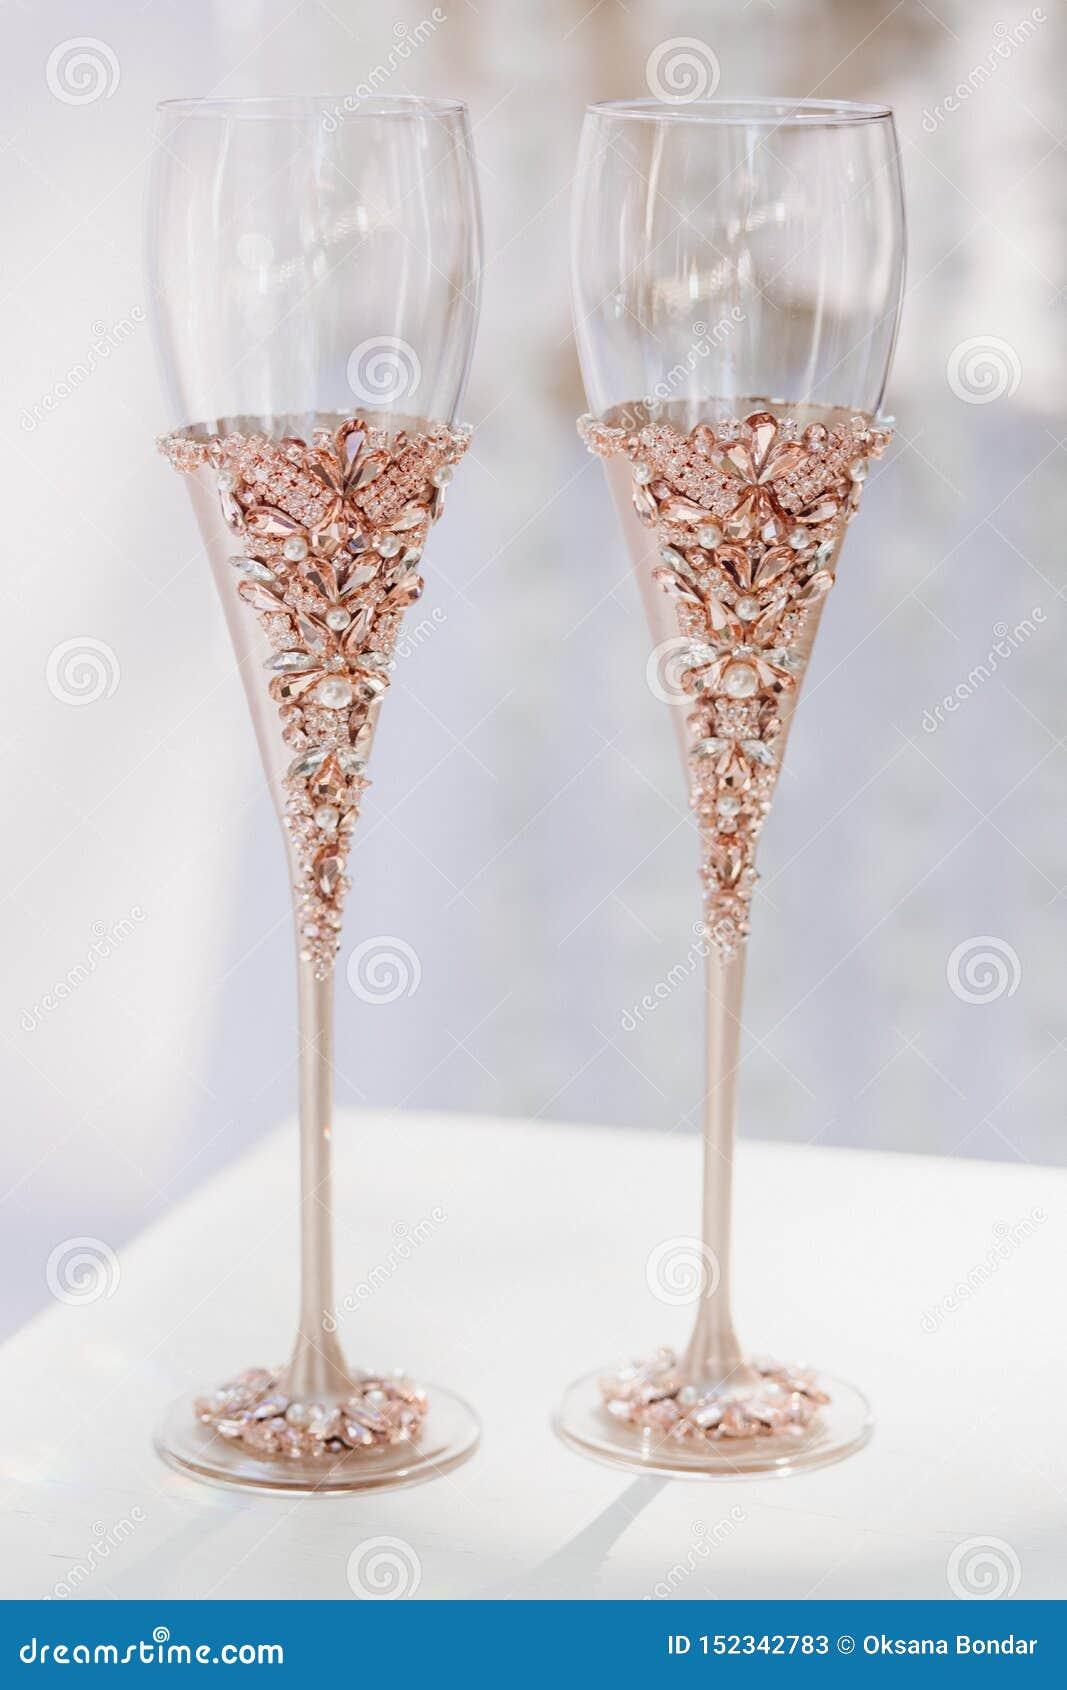 Wonderbaarlijk Elegant Champagne Glasses Voor Bruid En Bruidegom Stock Afbeelding VE-74